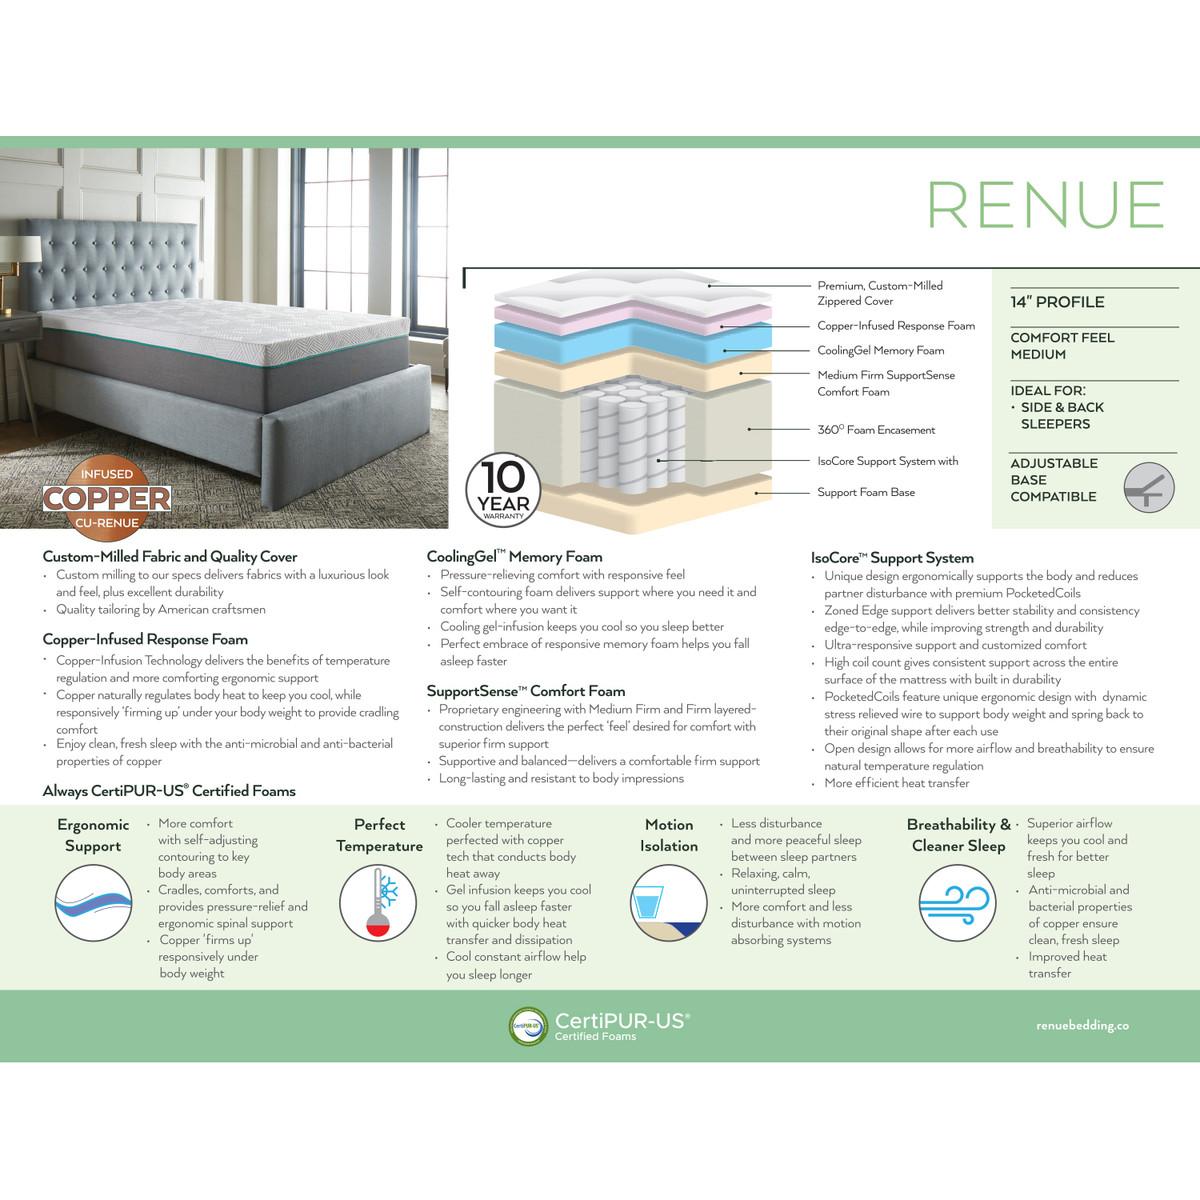 Renue Fourteen Inch Hybrid Mattress and Box